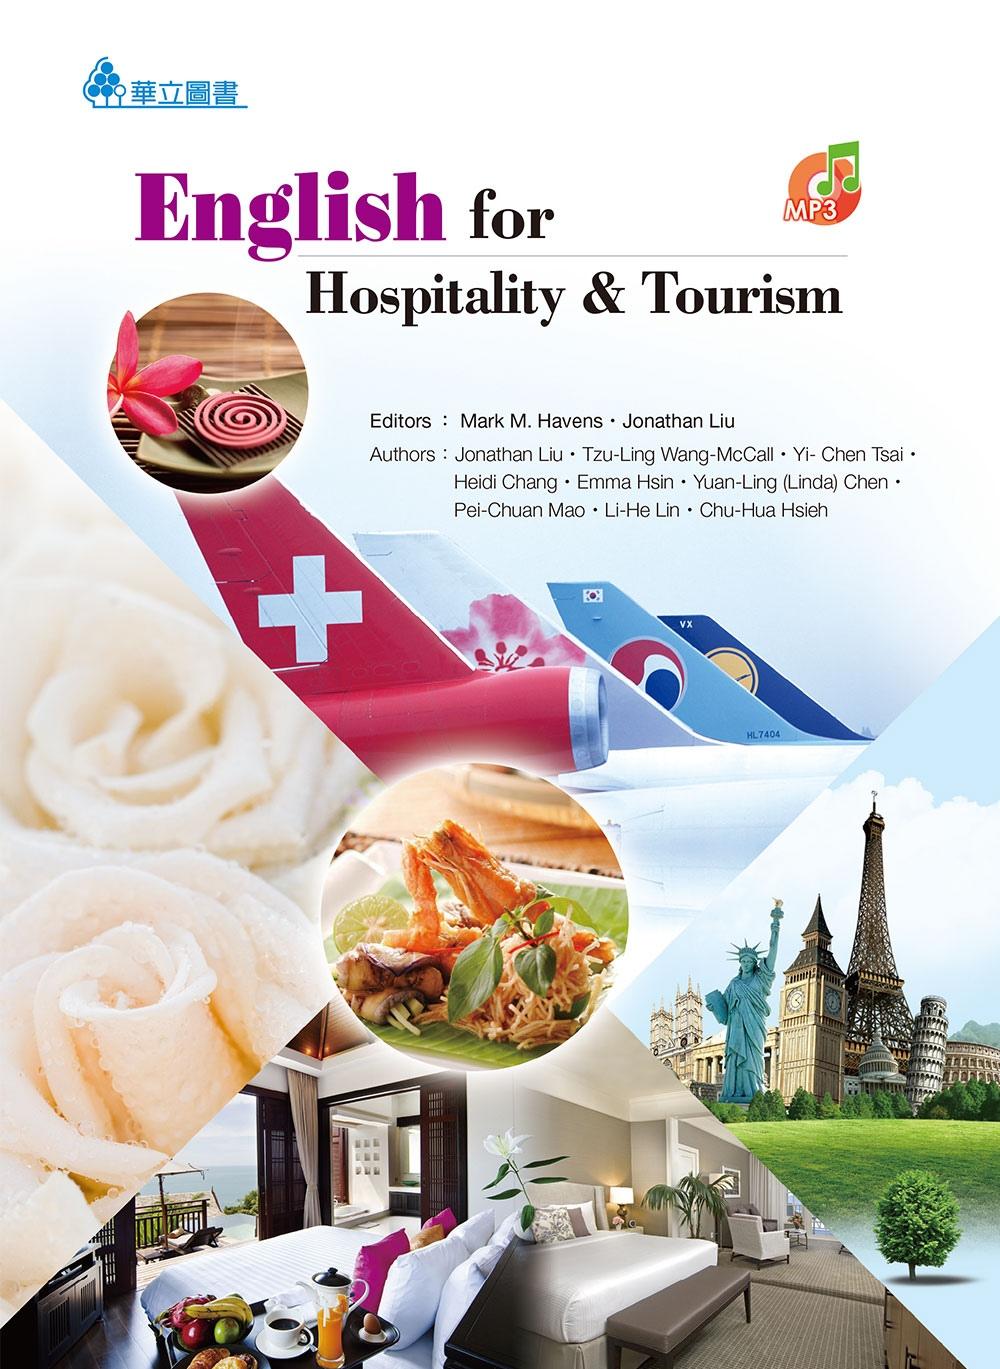 English for Hospitality & Tourism